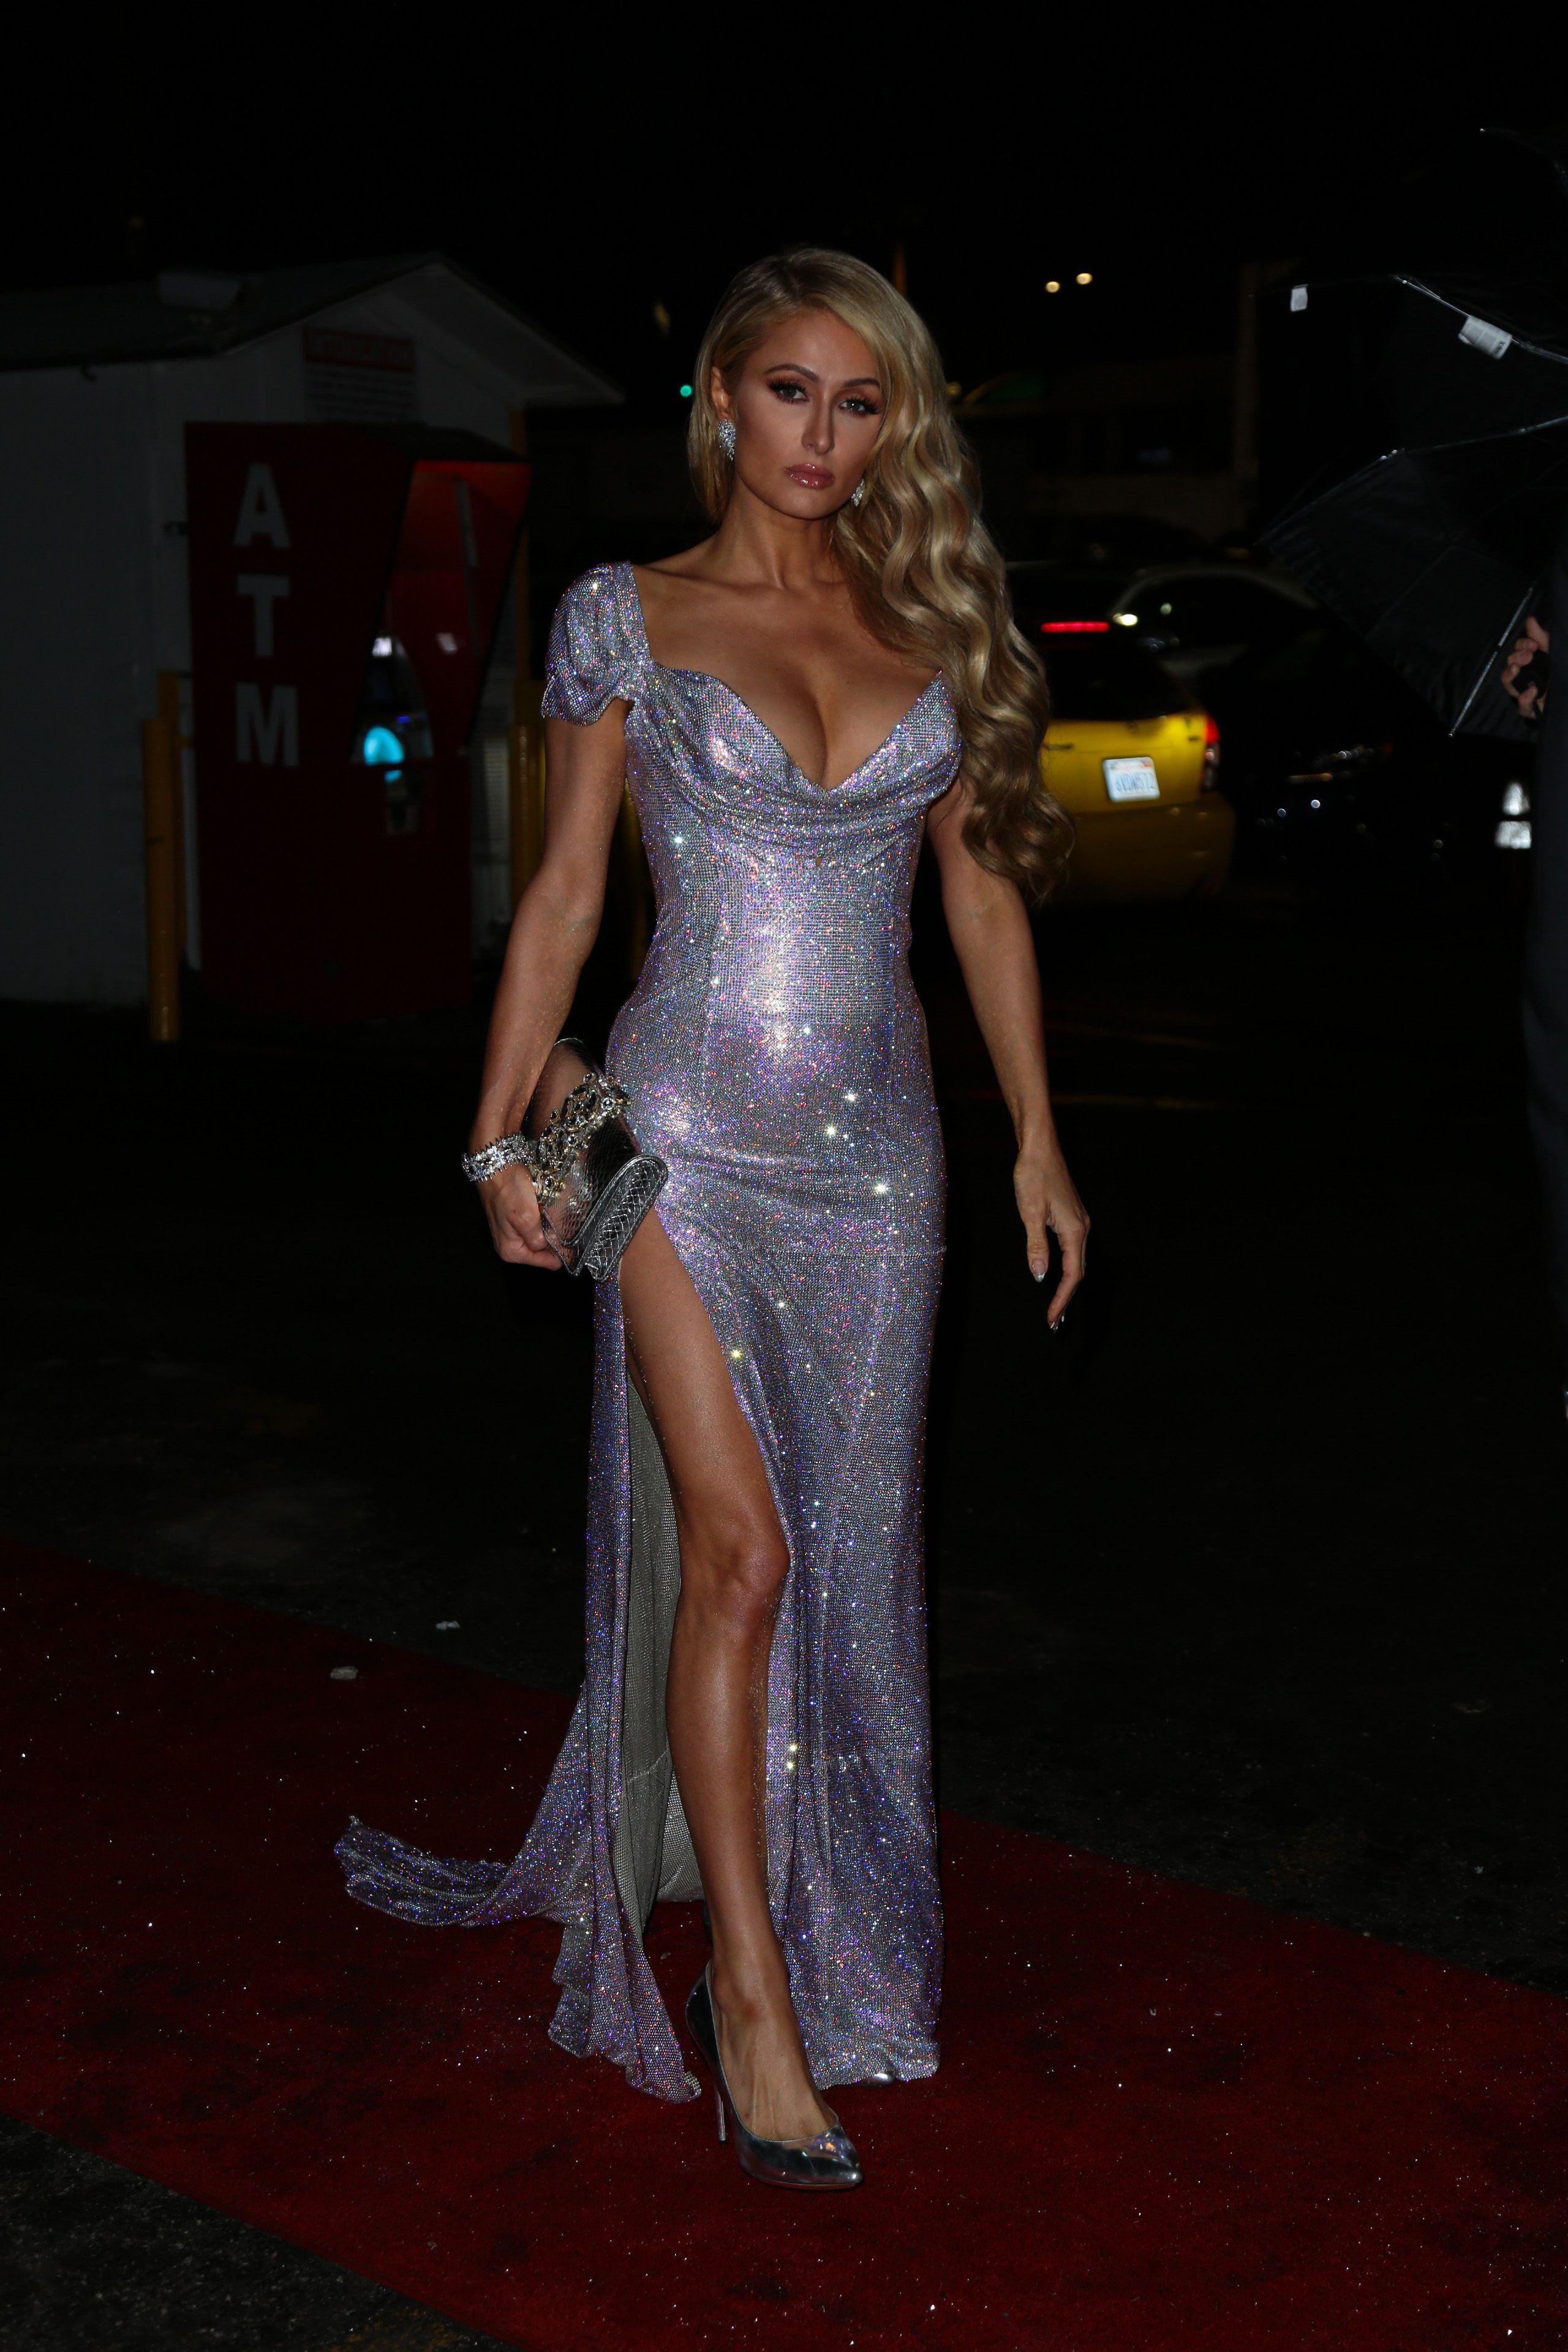 nude pics of Paris Hilton